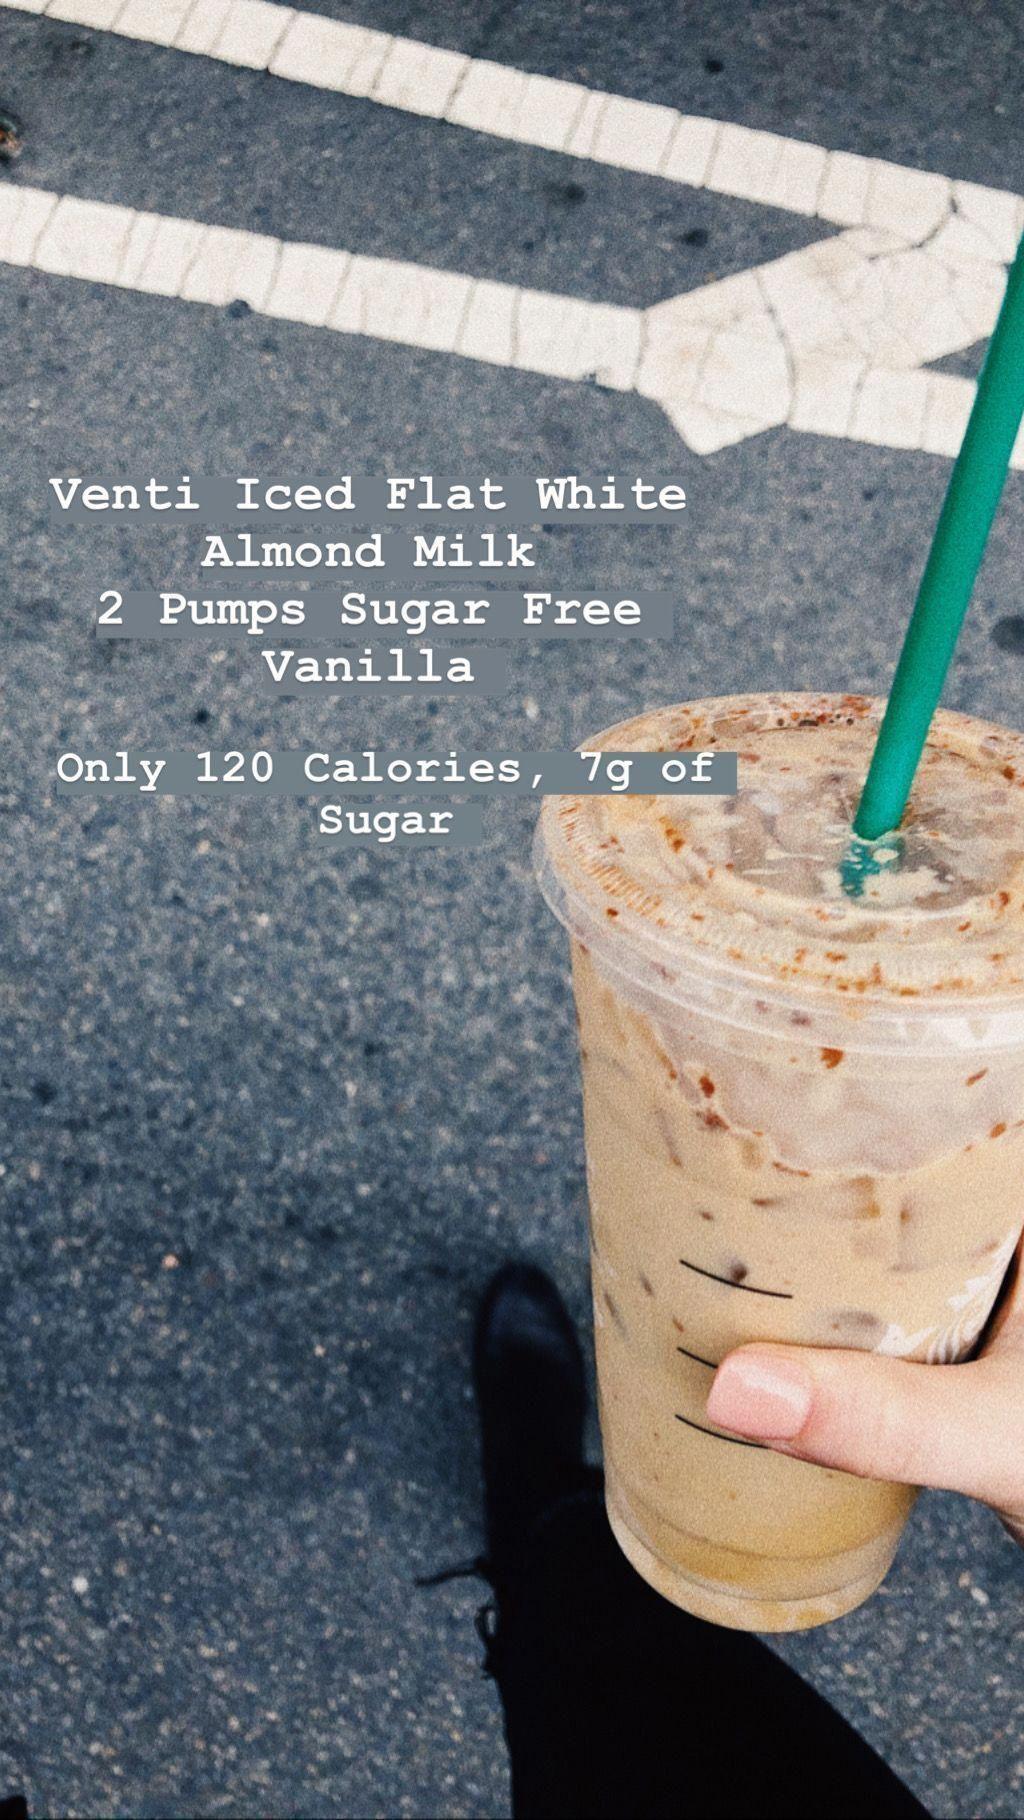 22+ Yummy coffee drinks at starbucks ideas